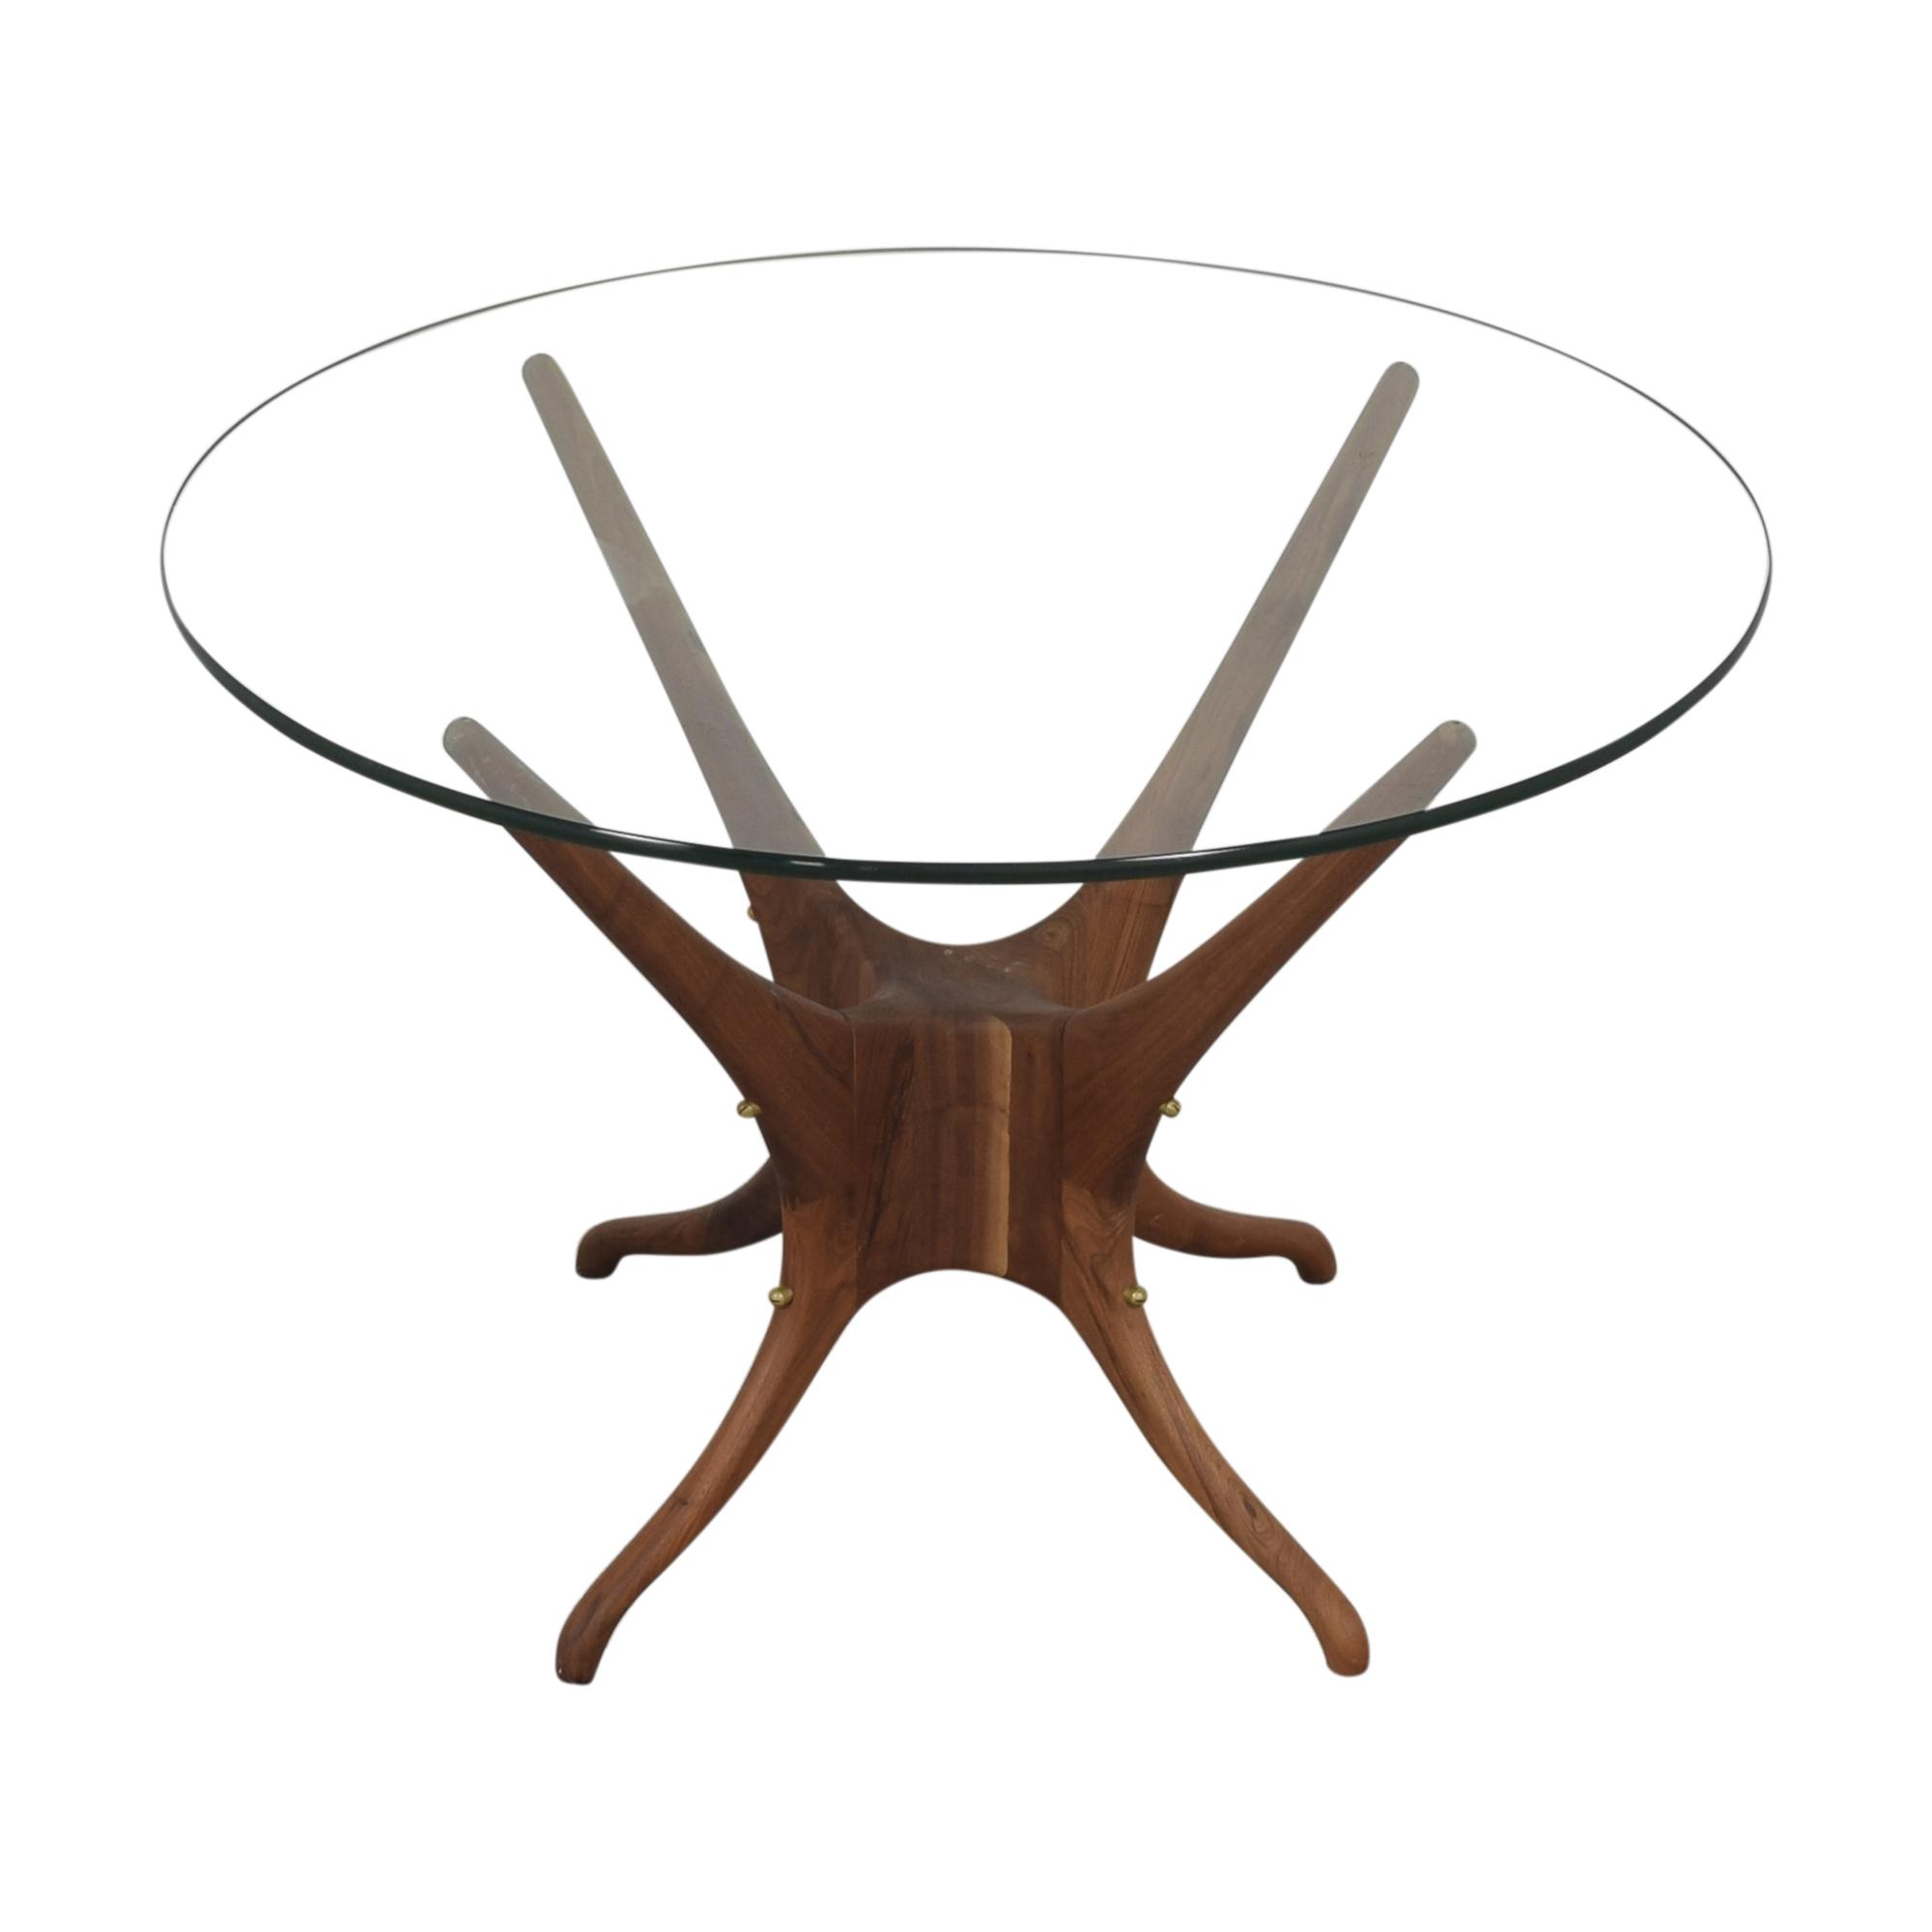 Organic Modernism Organic Modernism Okto Round Dining Table coupon